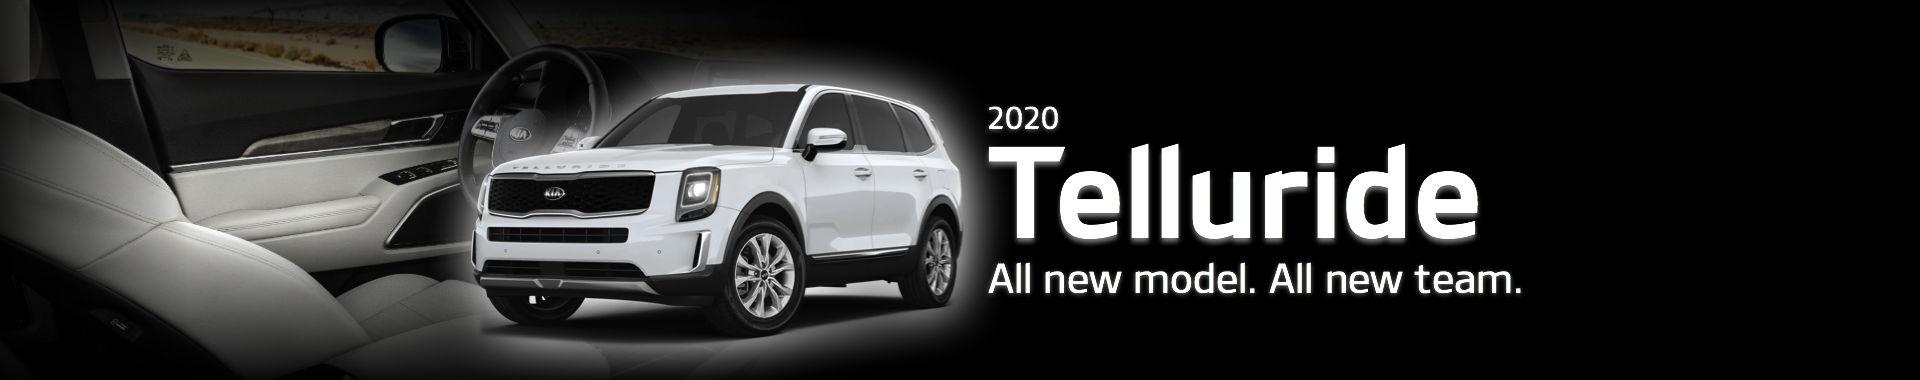 NEK - 2020 Telluride Soft Launch